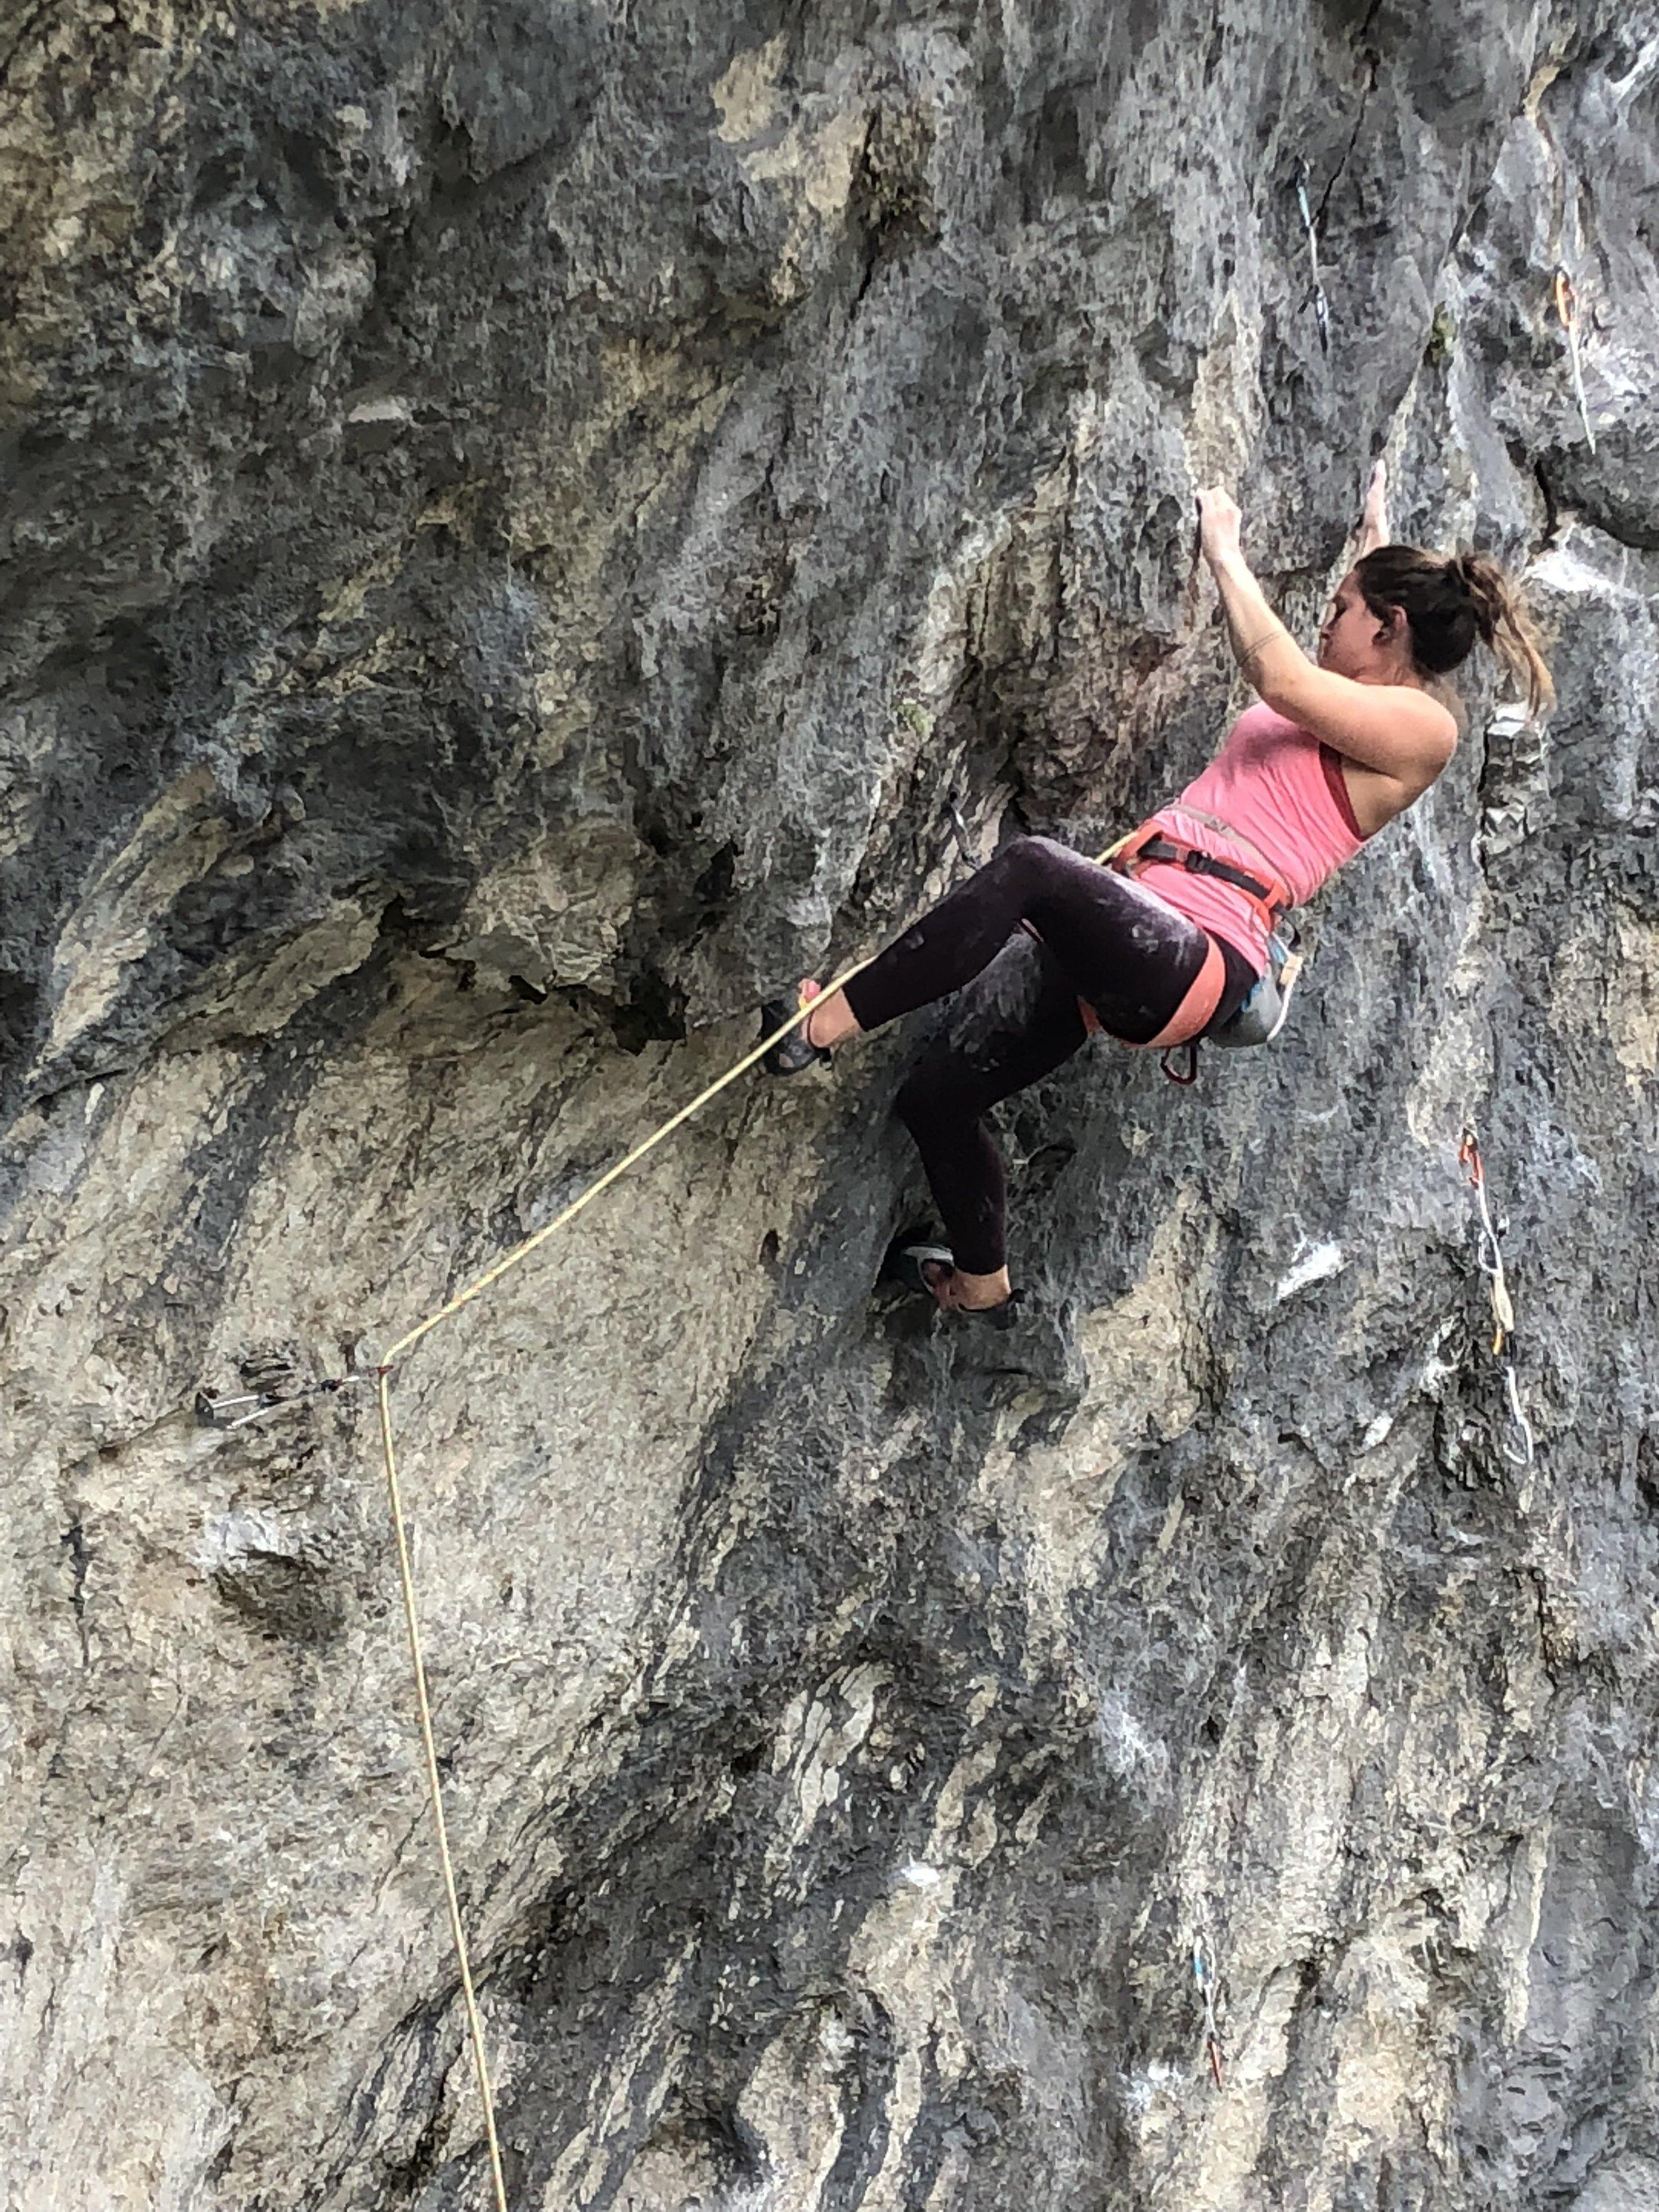 Chelsea climbing Dr. Bland's Muscle Building Traverse at Metaline Falls, Washington. Photo by Brett Jessen.